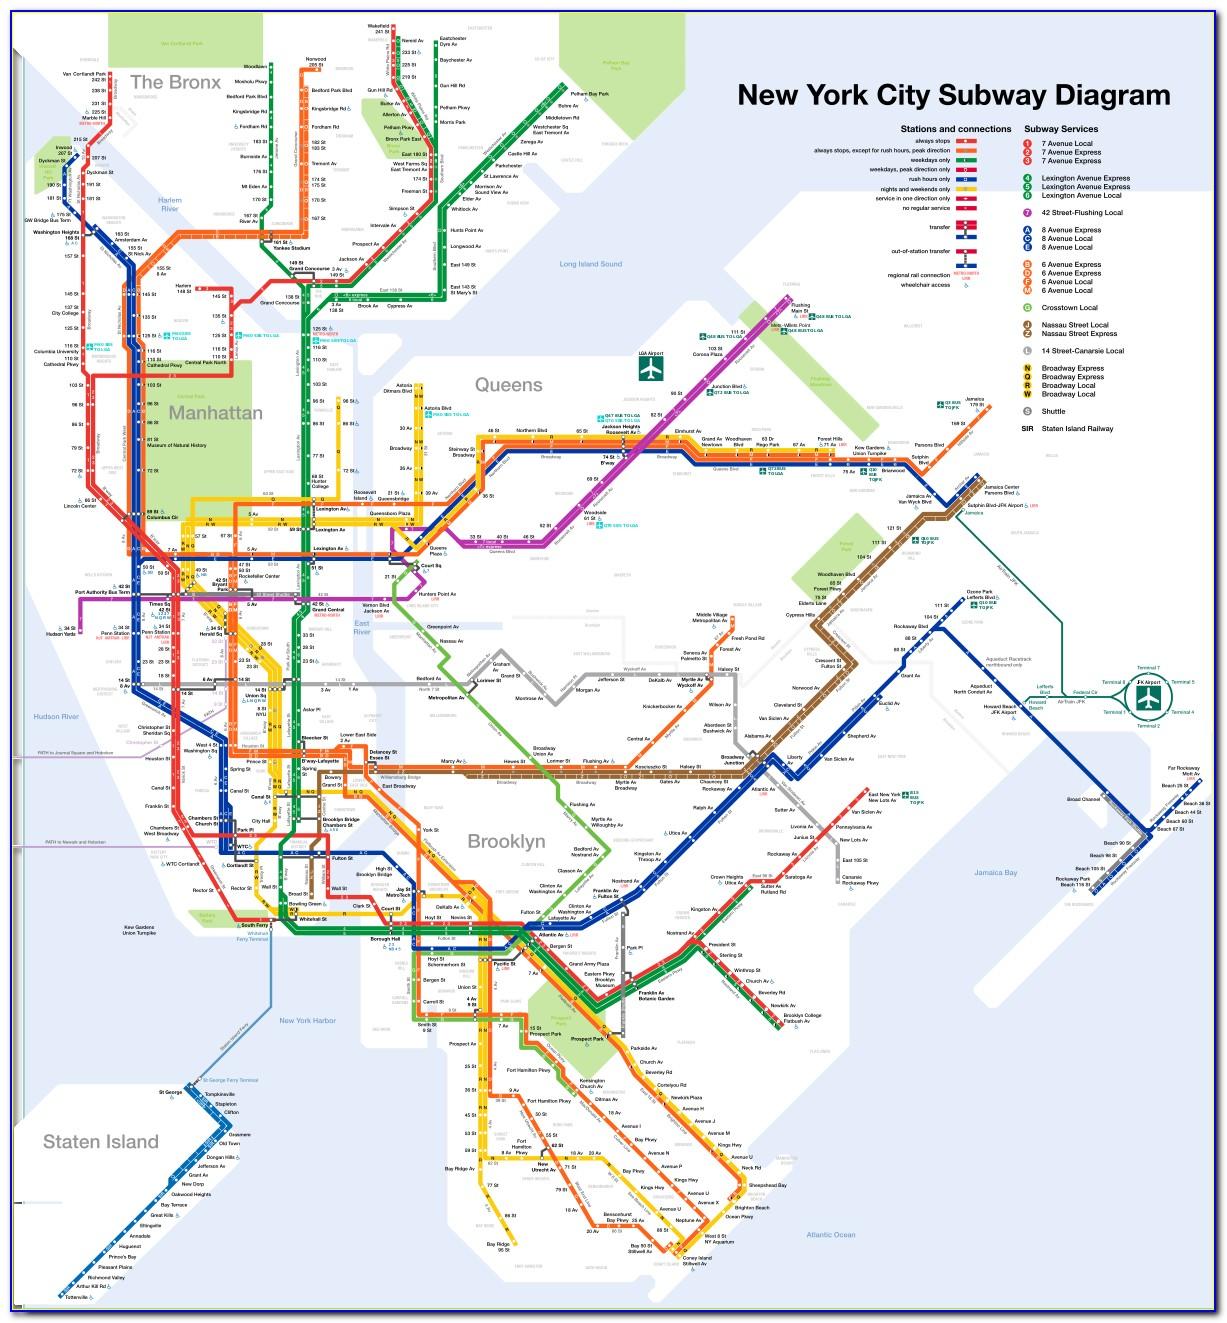 Subway Map Of New York